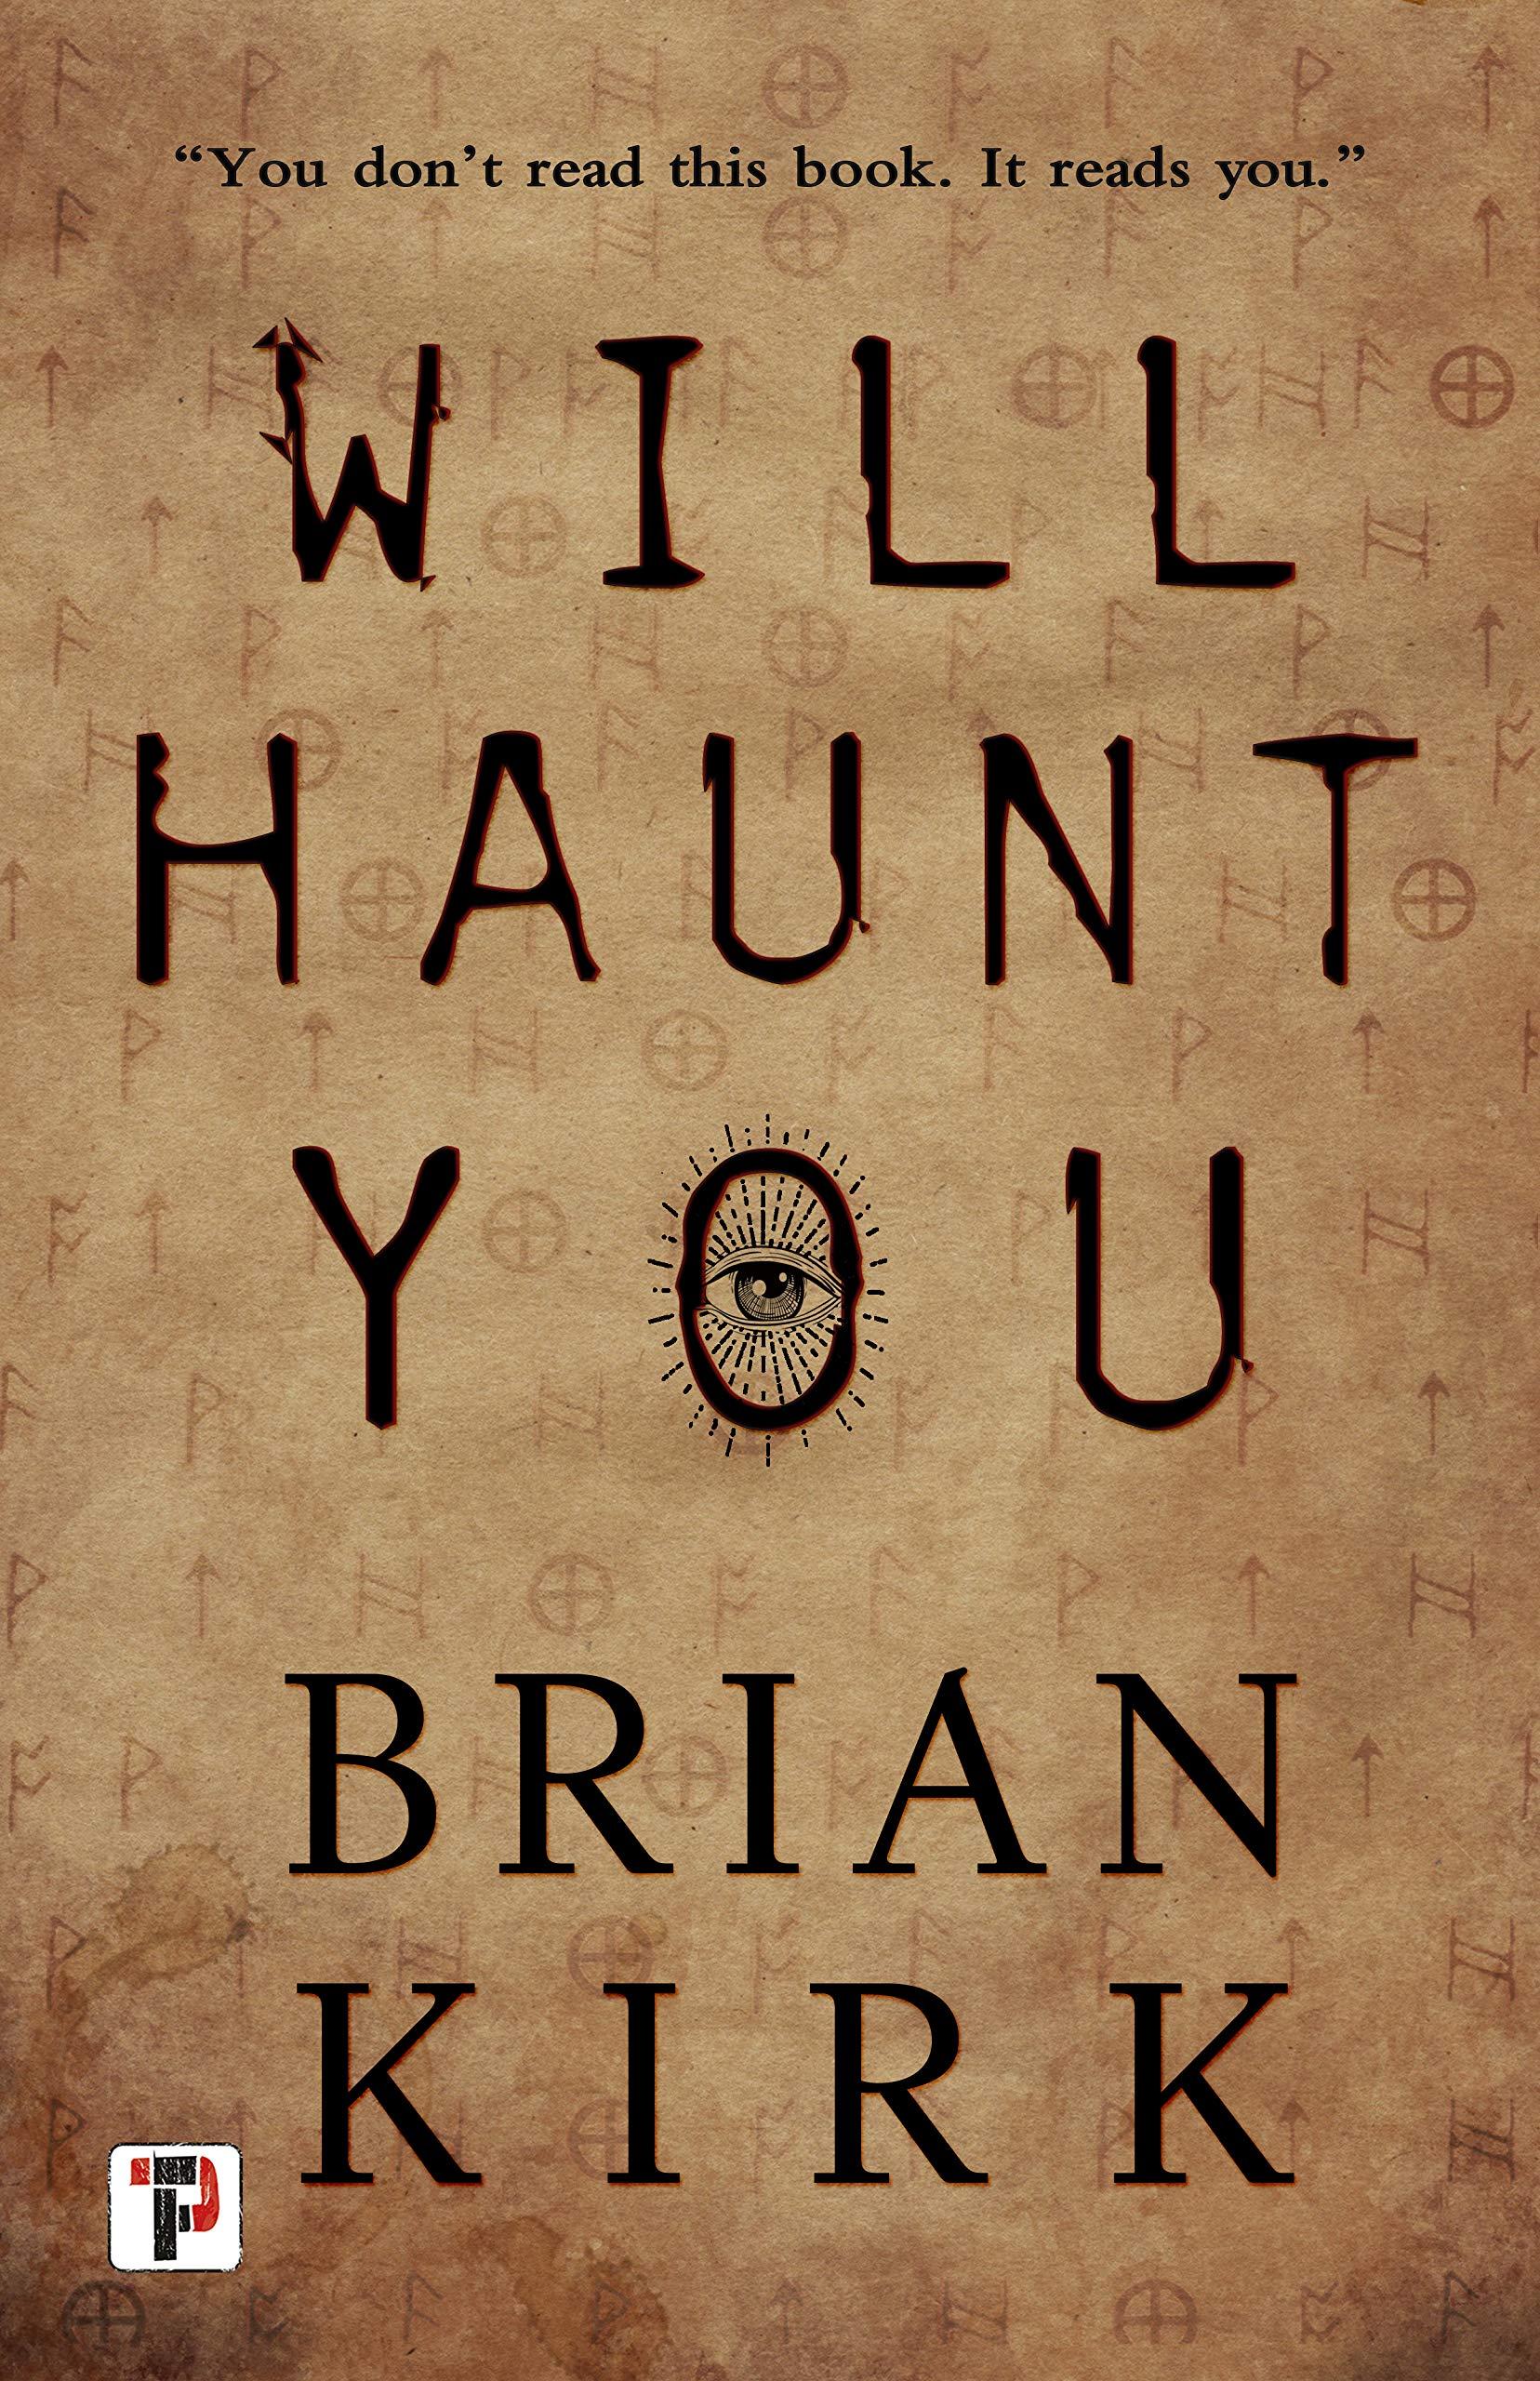 will+haunt+you_brian+kirk.jpg